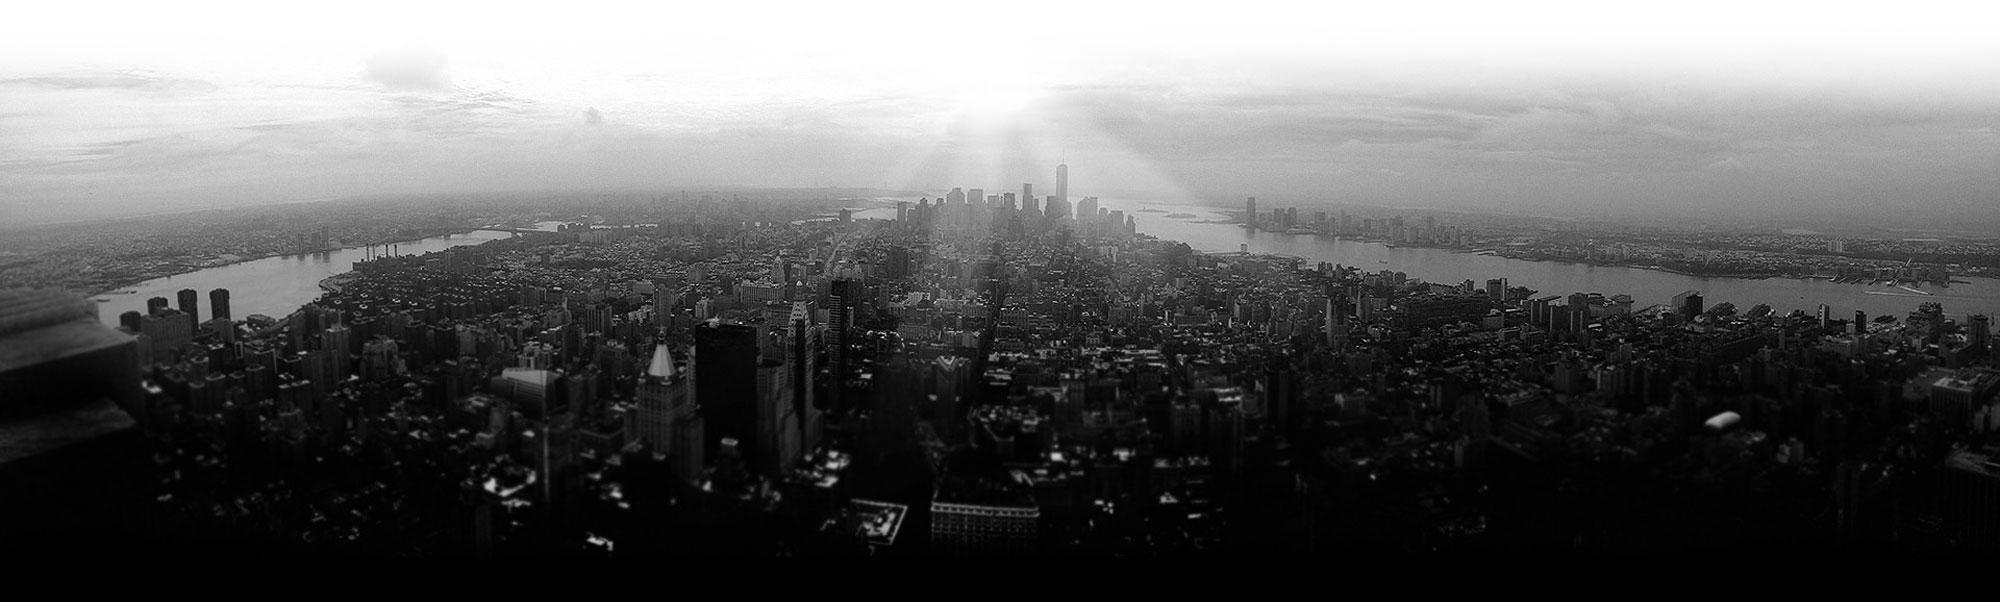 Pny New York City Black